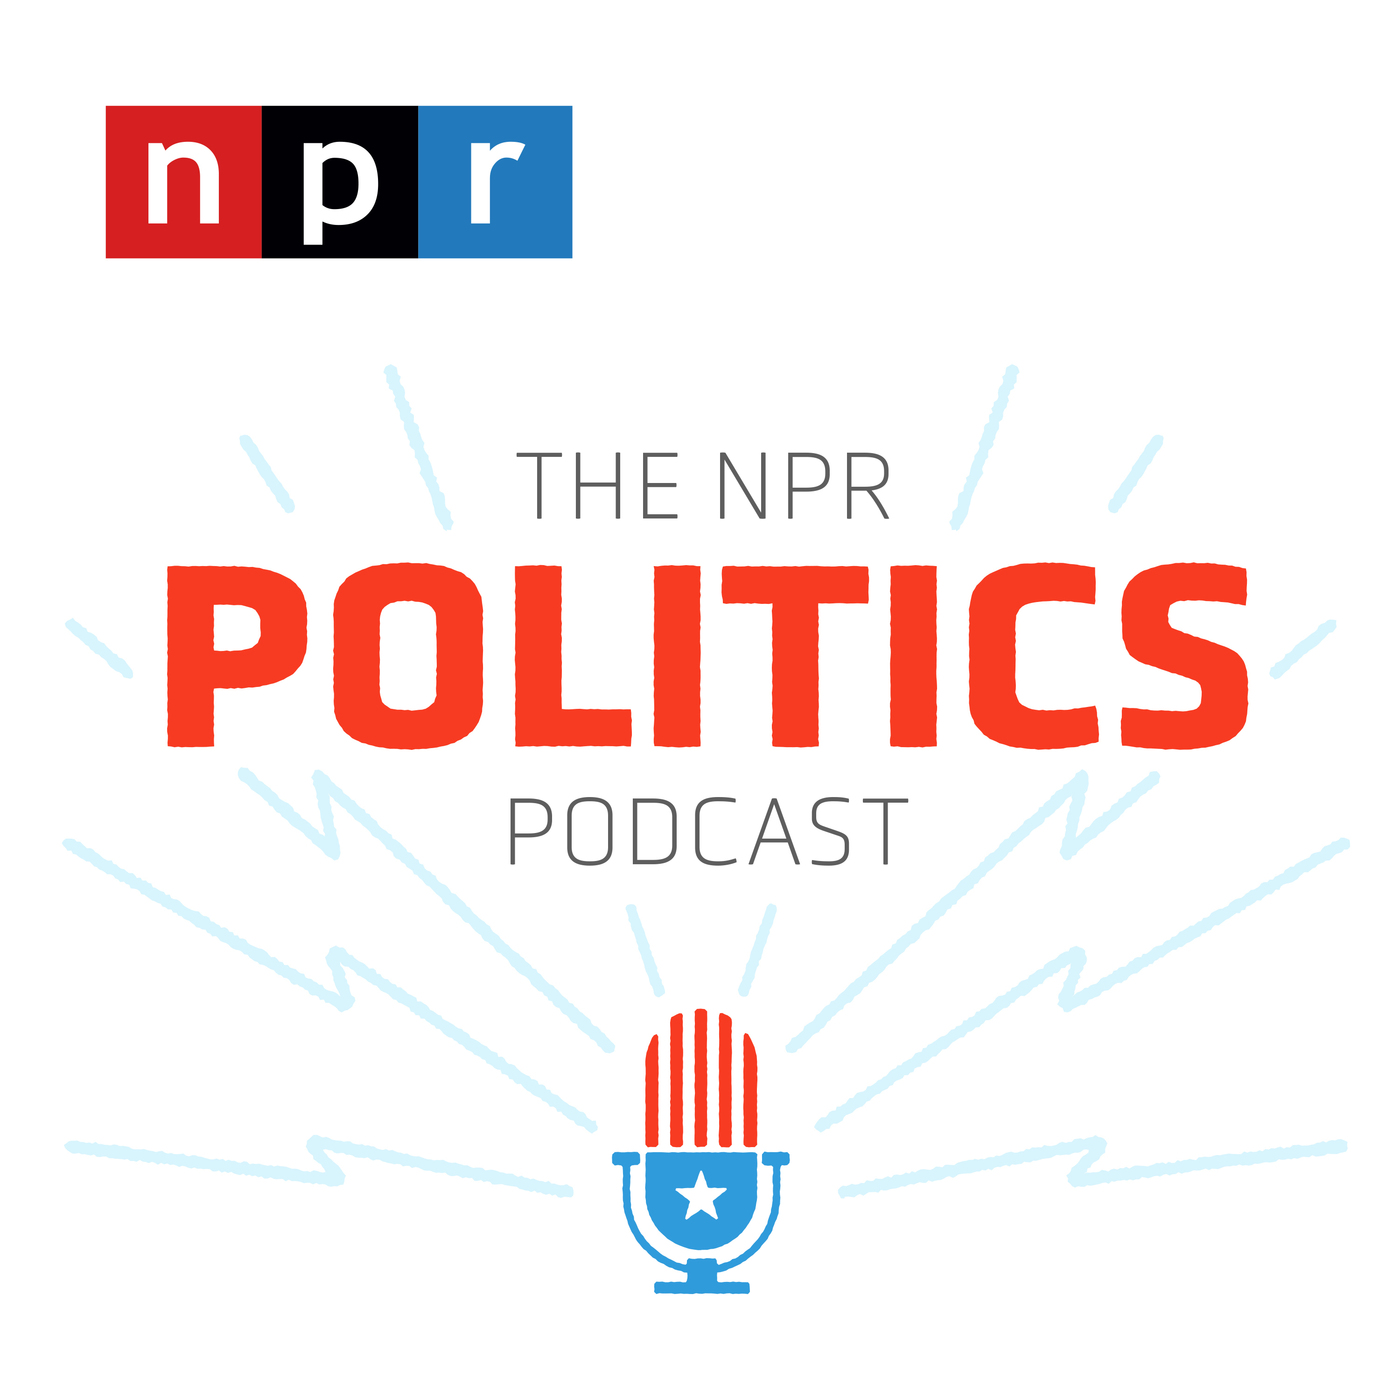 The NPR Politics Podcast logo